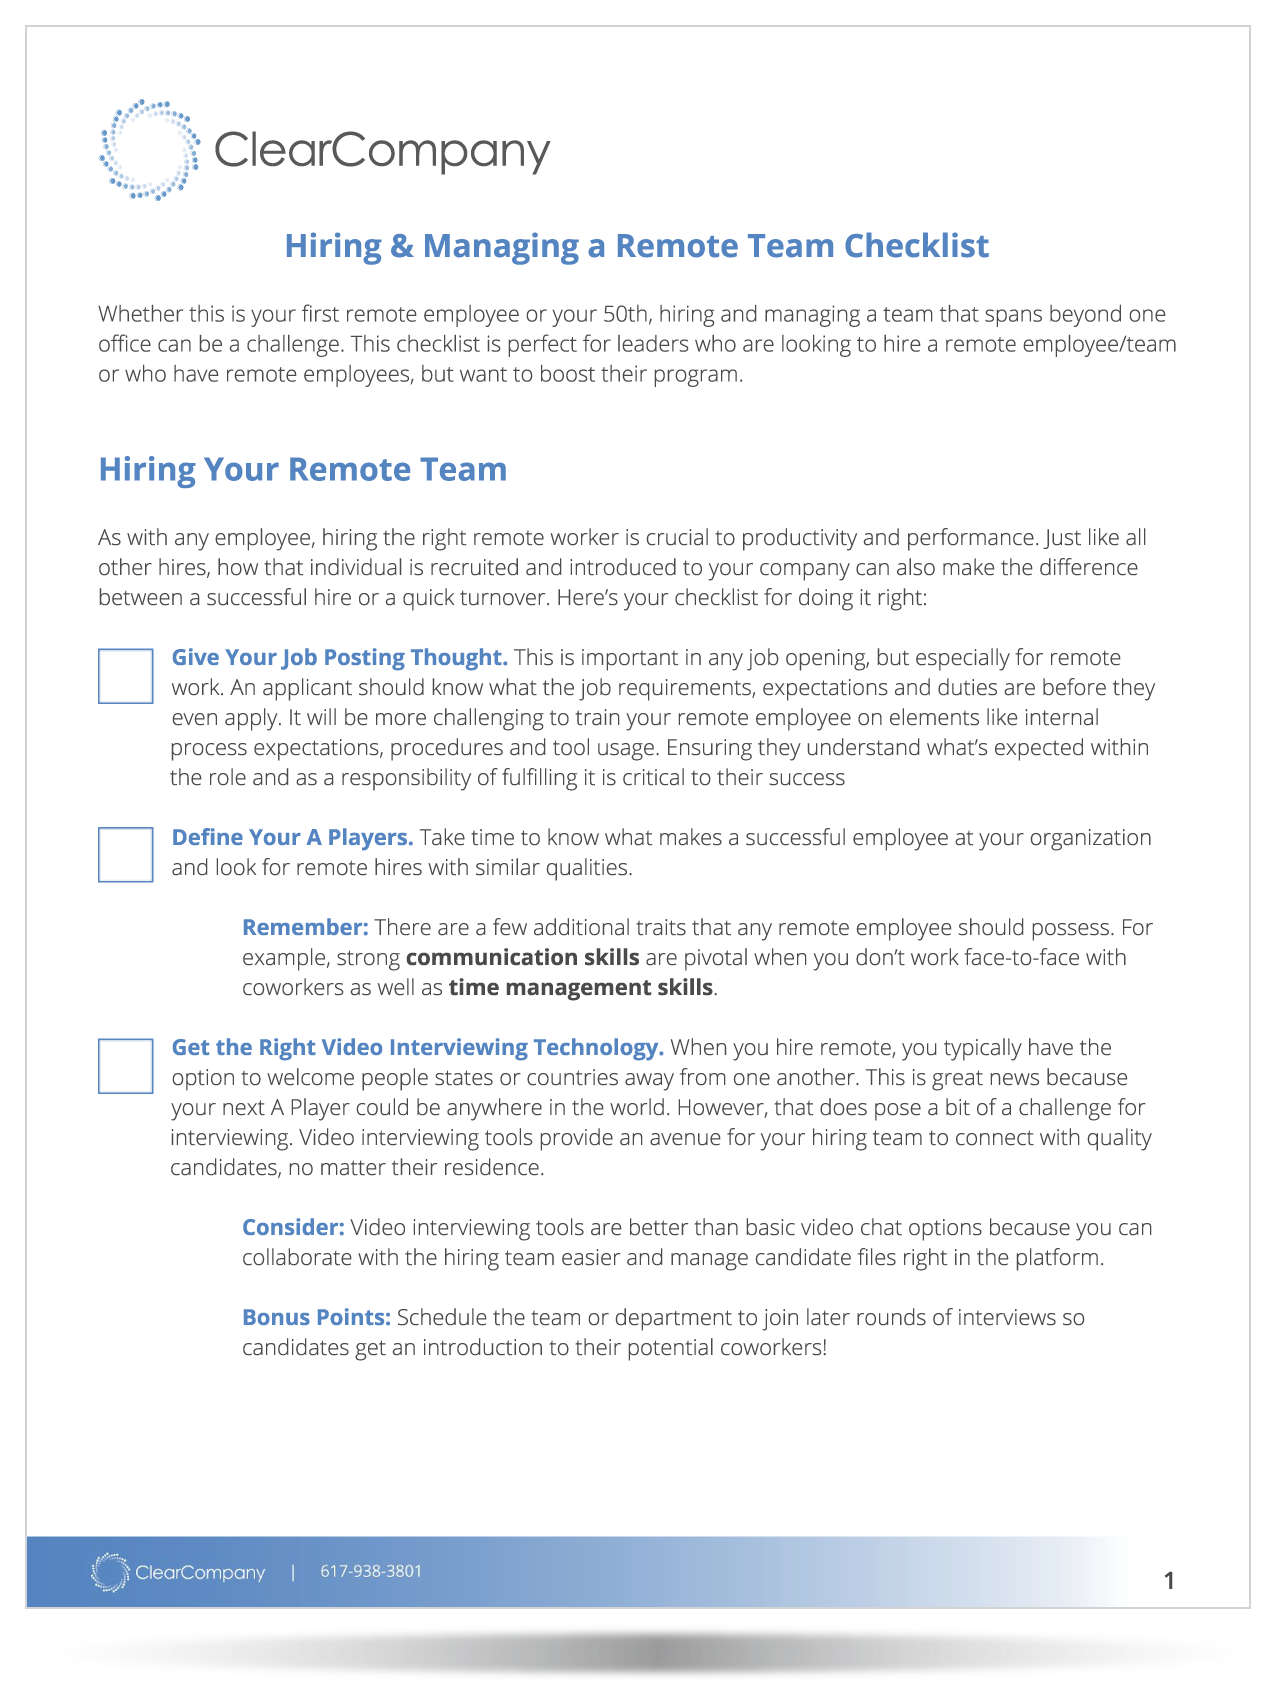 Mockup-Hiring-and-Managing-a-Remote-Team-Checklist-Printable-LP-Header